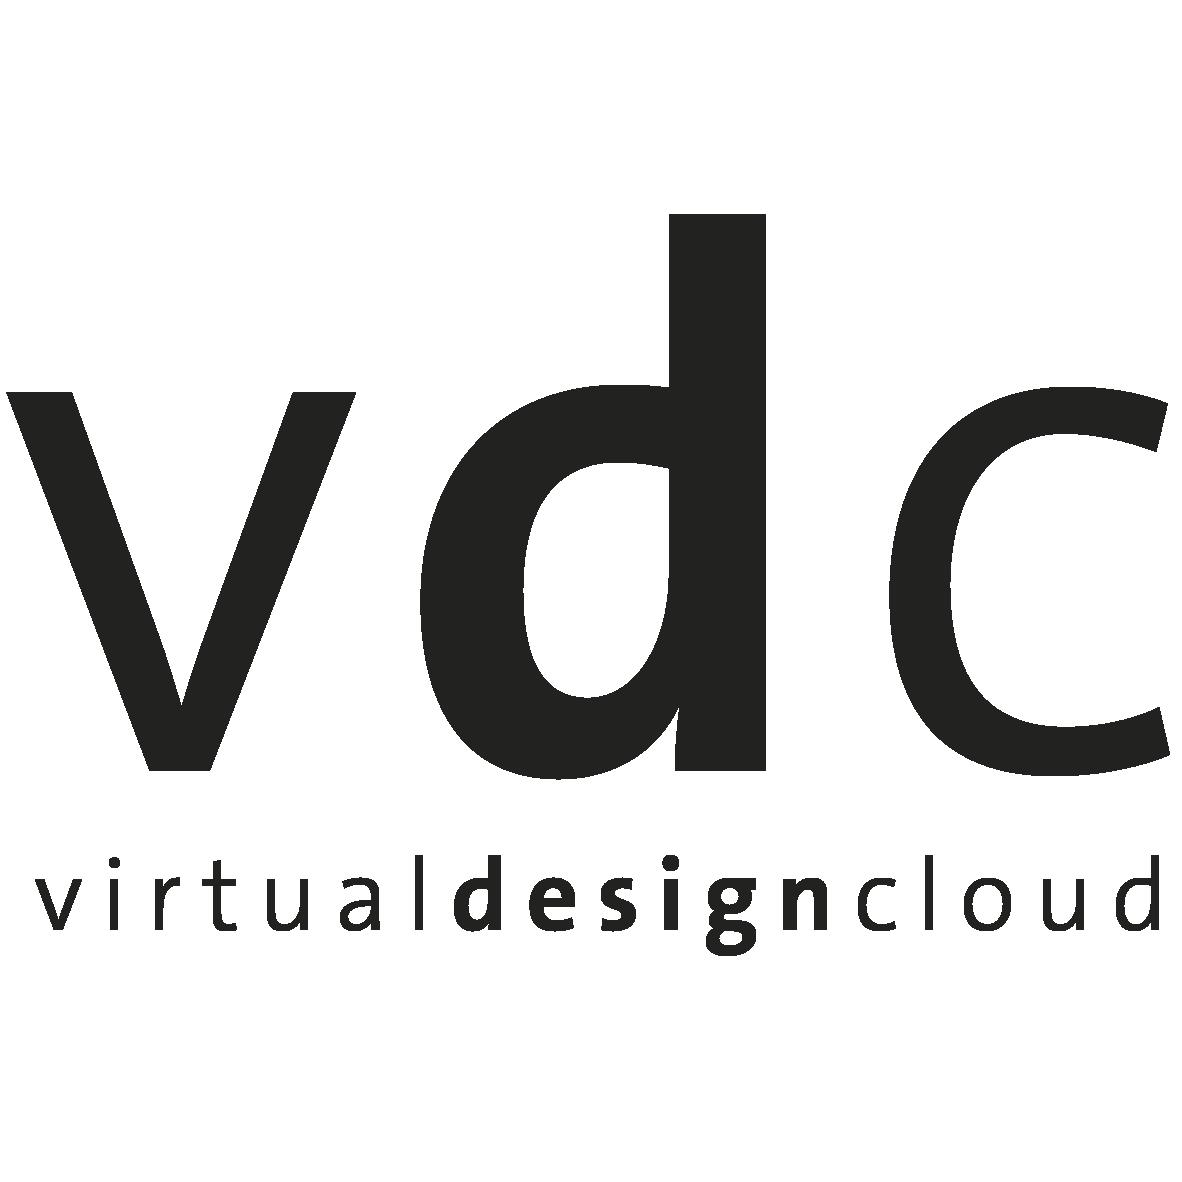 virtualdesigncloud design agency